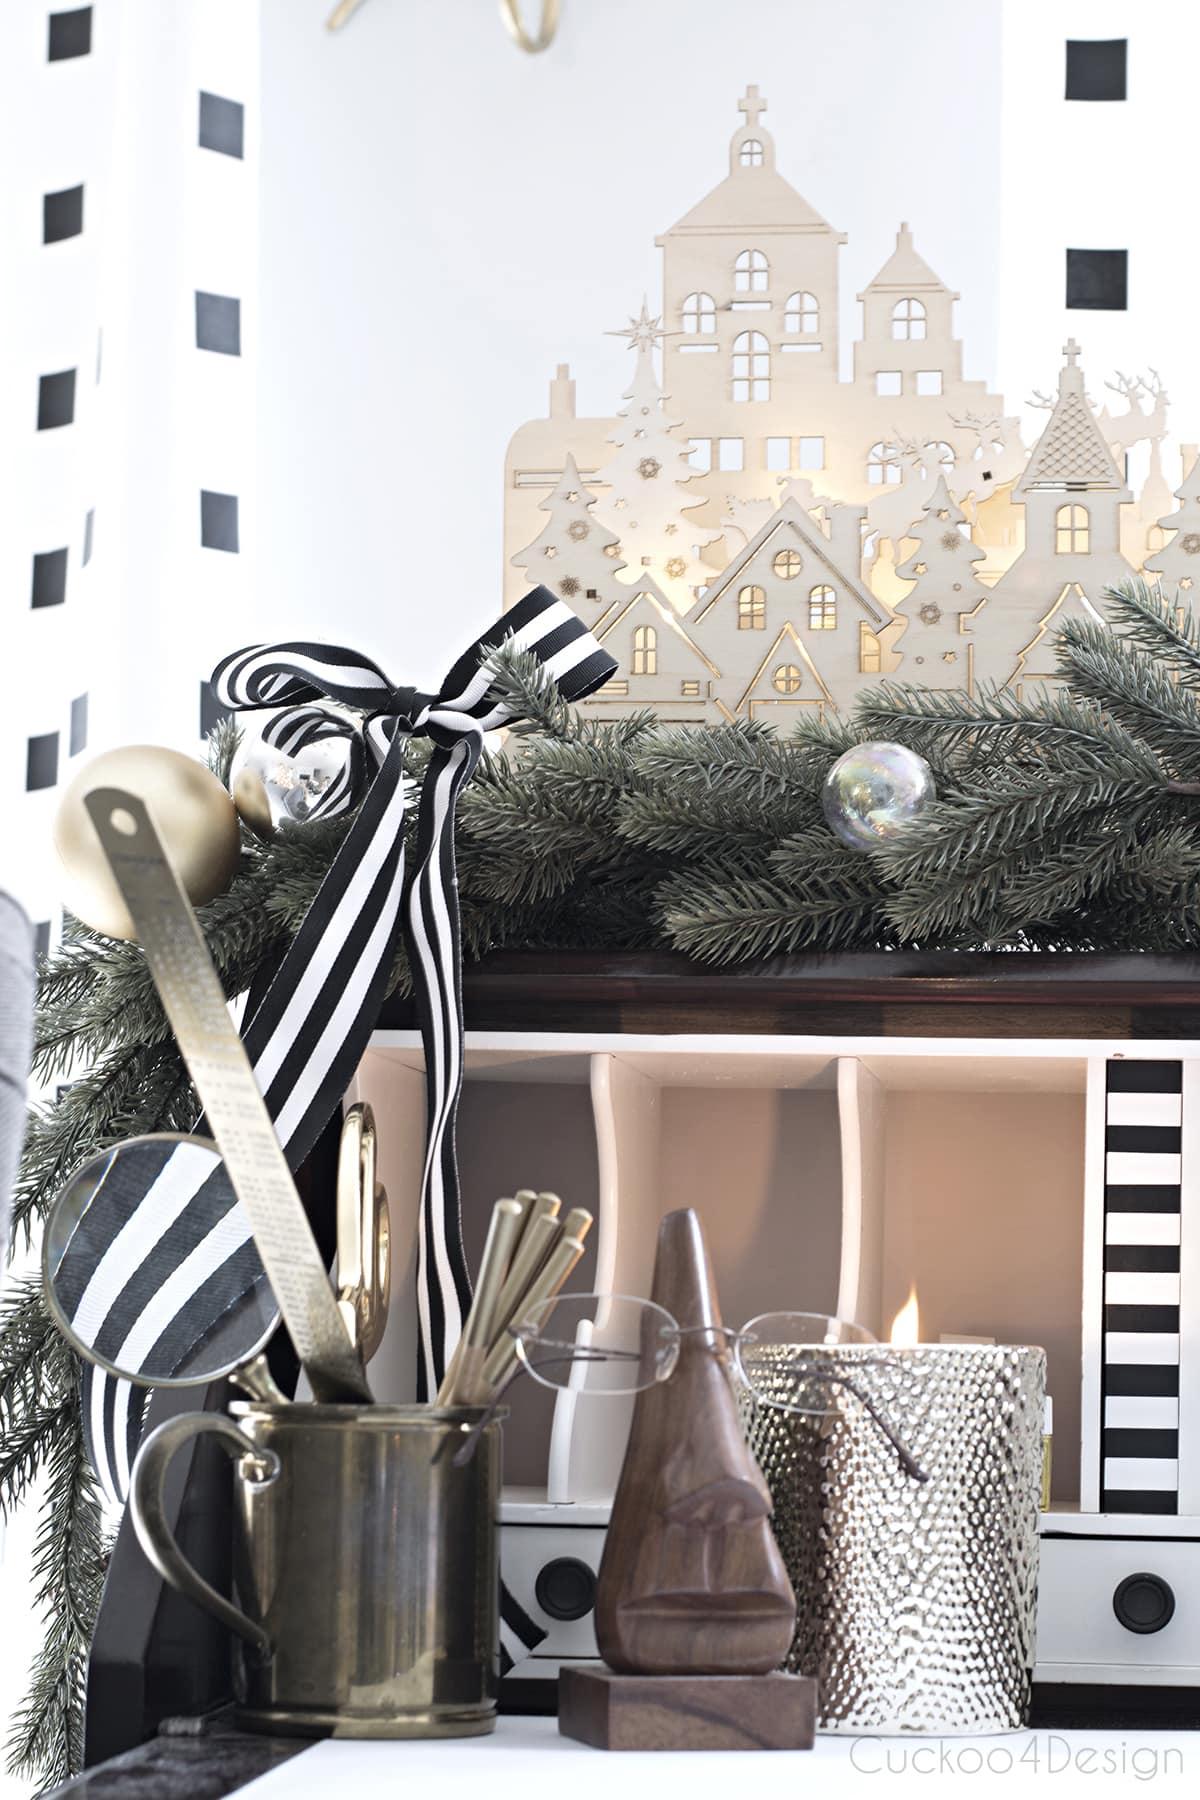 wooden Christmas village on desk